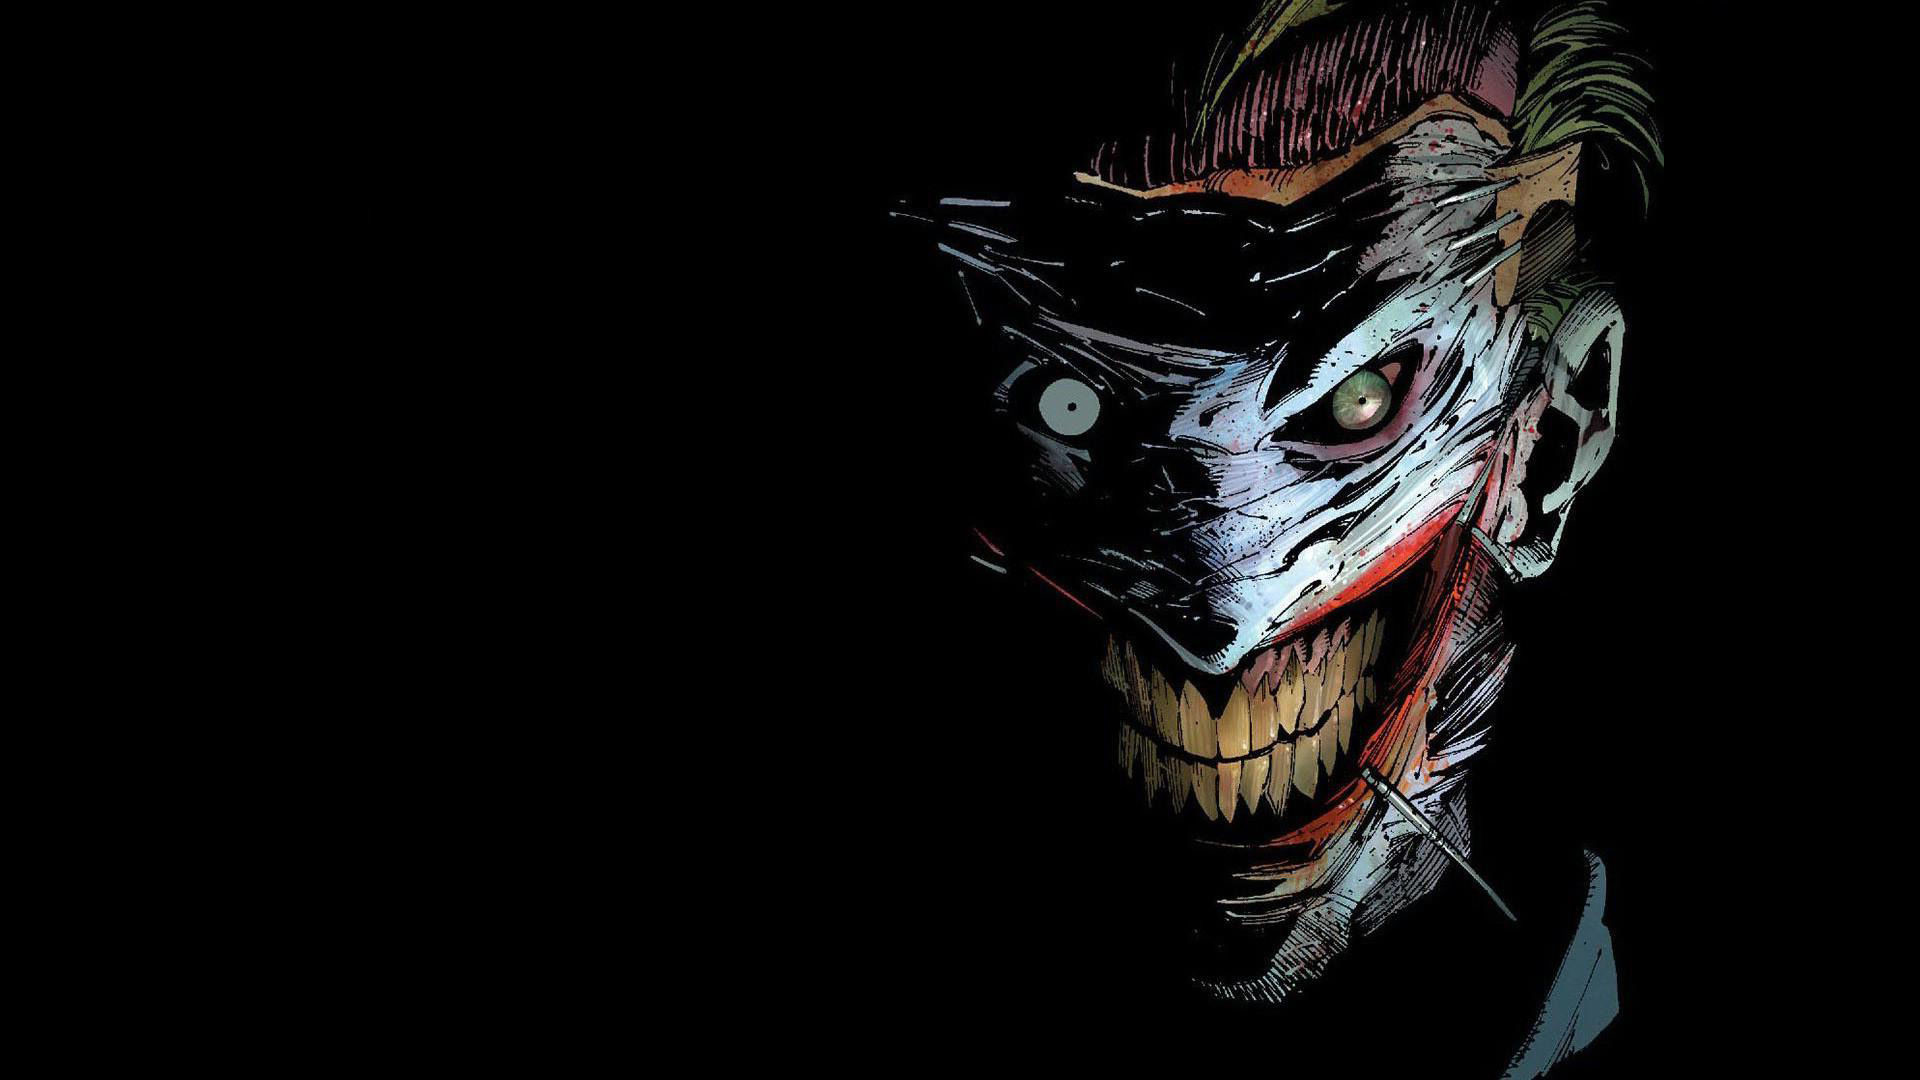 Amazing Cool Joker Wallpaper Hd